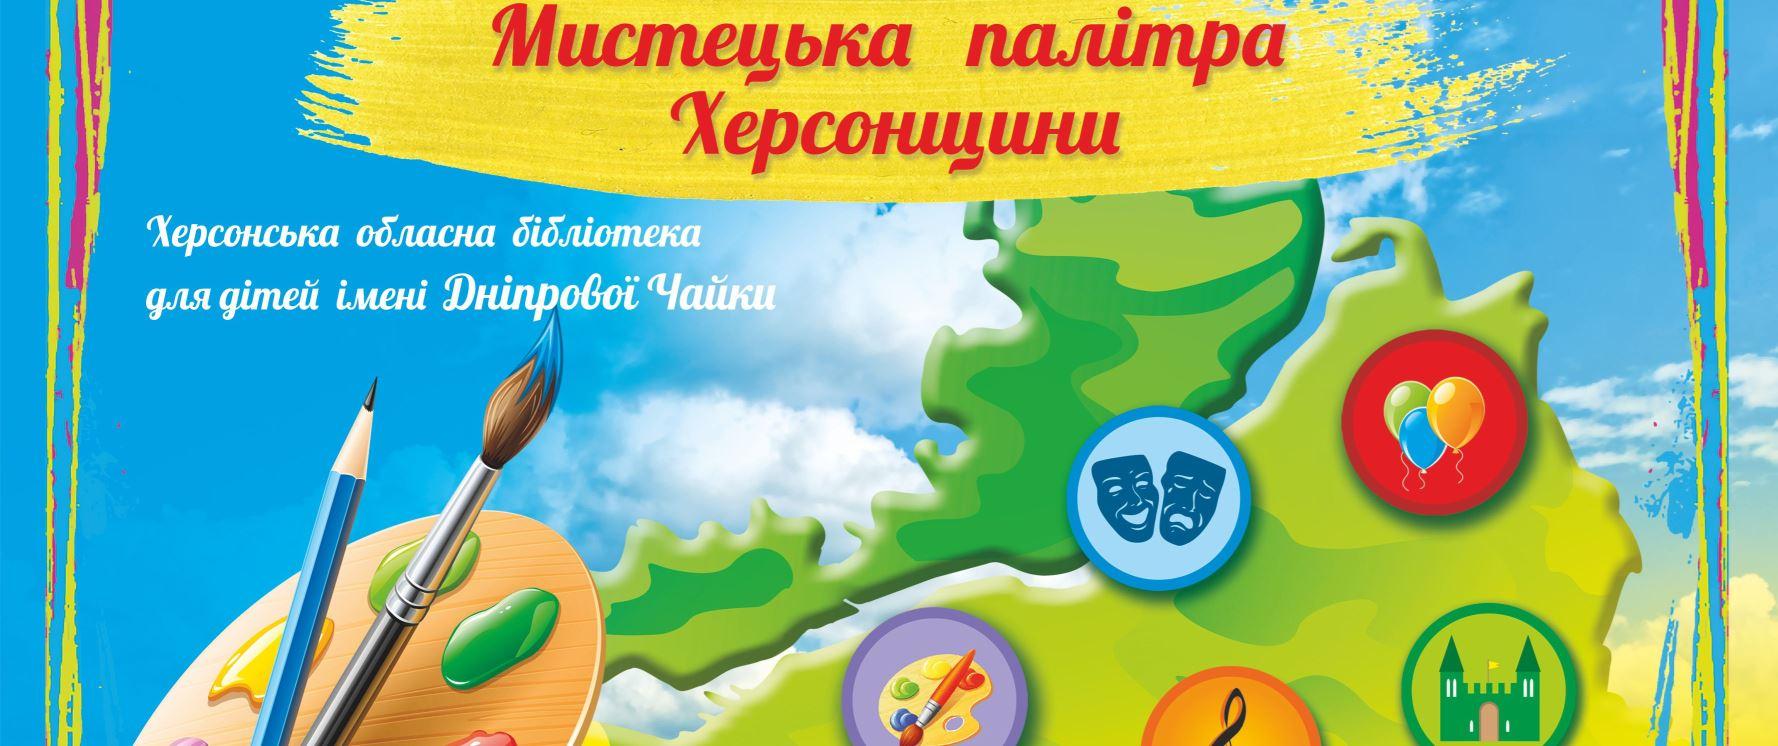 """Мистецька палітра Херсонщини"""